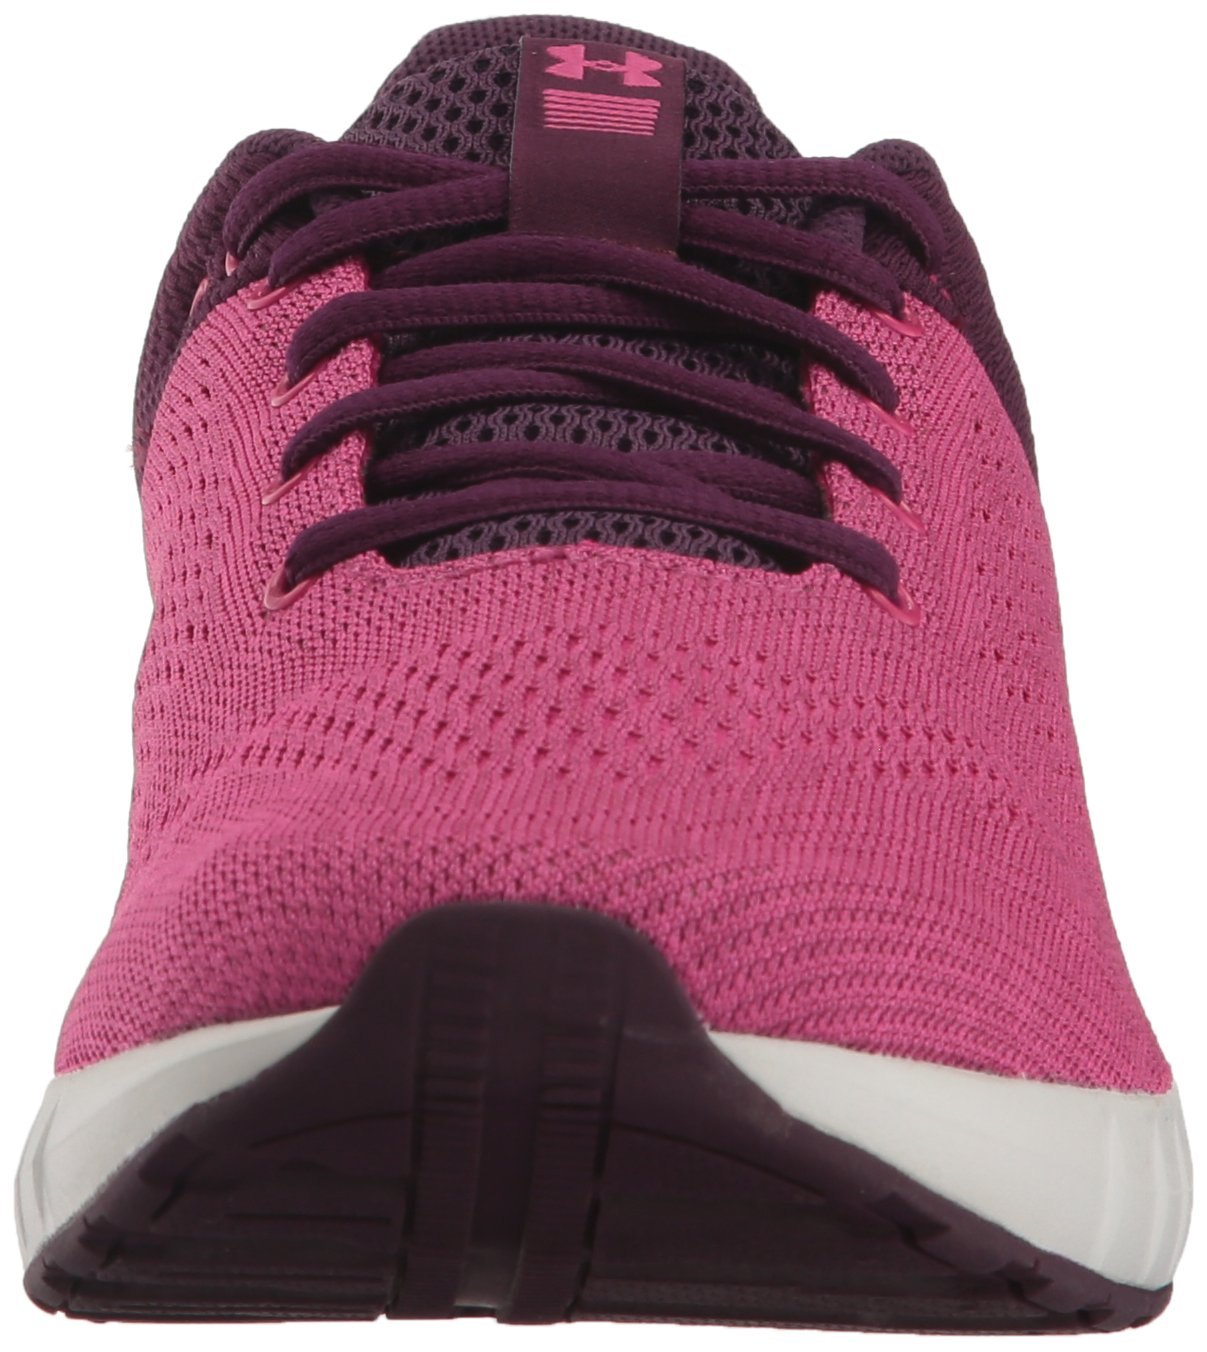 Under Armour Sneaker Women's Micro G Pursuit Sneaker Armour B071HMVWFF 10 M US|Merlot (501)/Elemental 8a9257